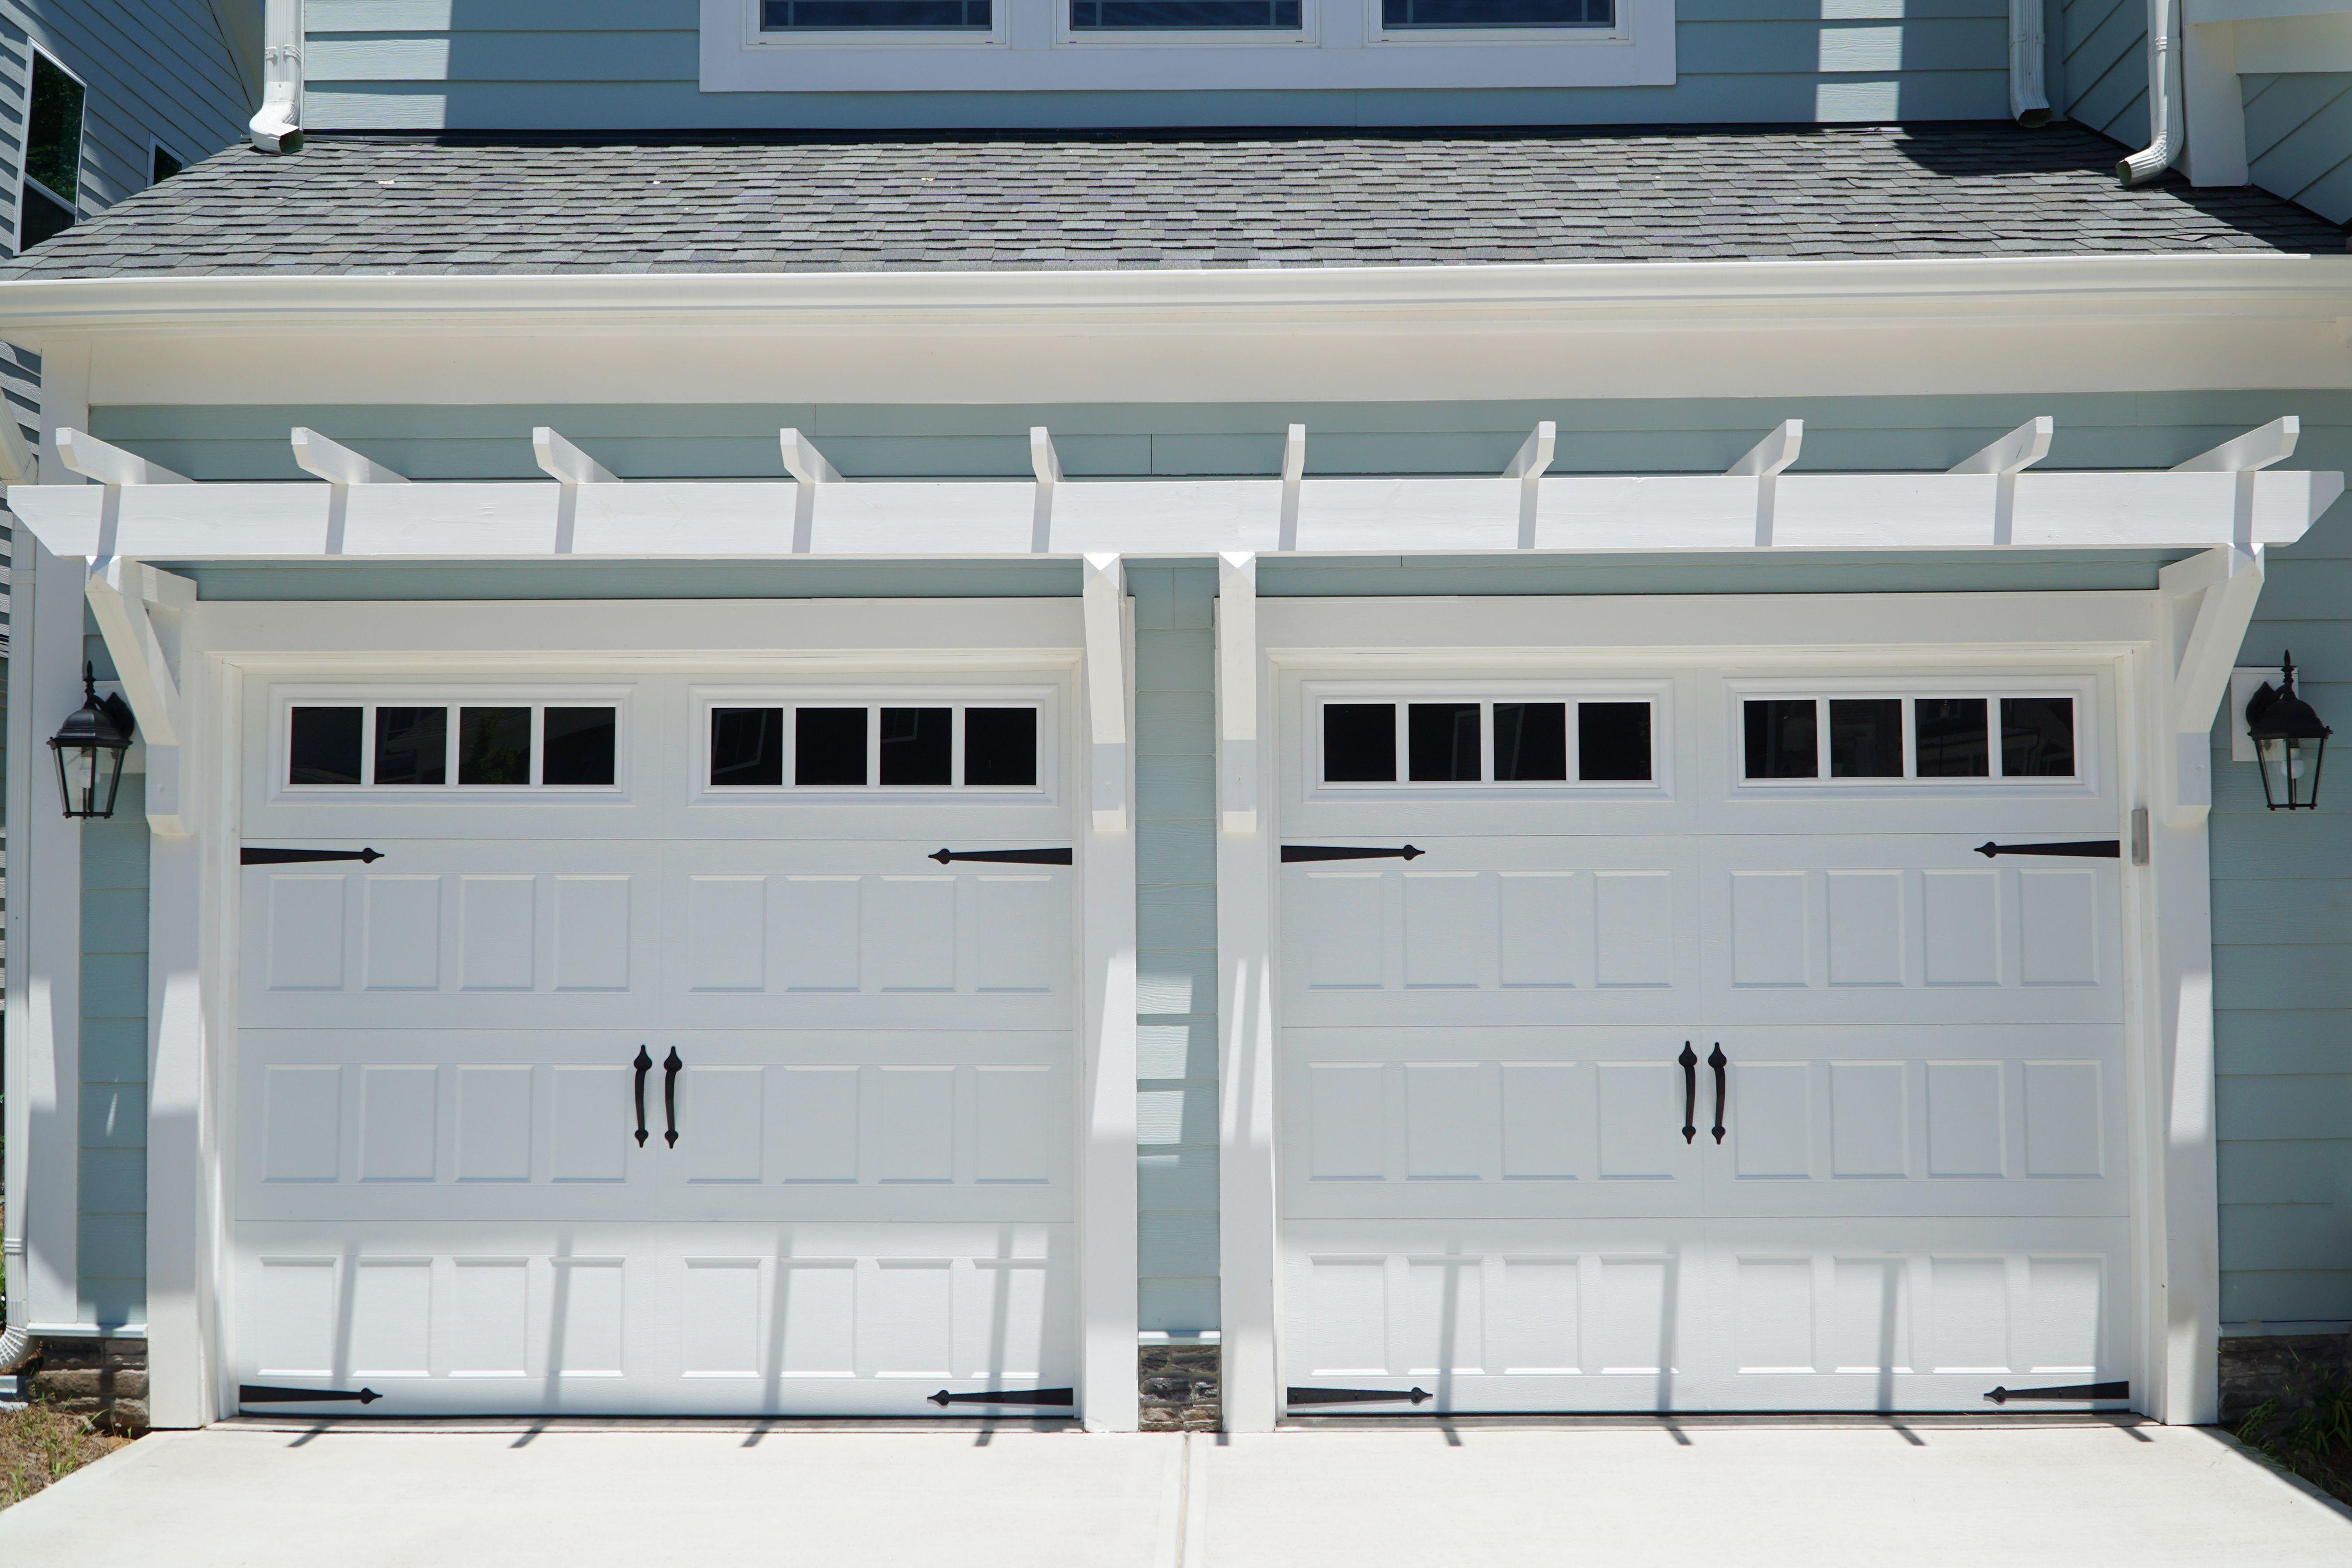 Insulated Garage Doors In Virginia Beach Va In 2021 Garage Doors Garage Door Repair Garage Door Opener Repair